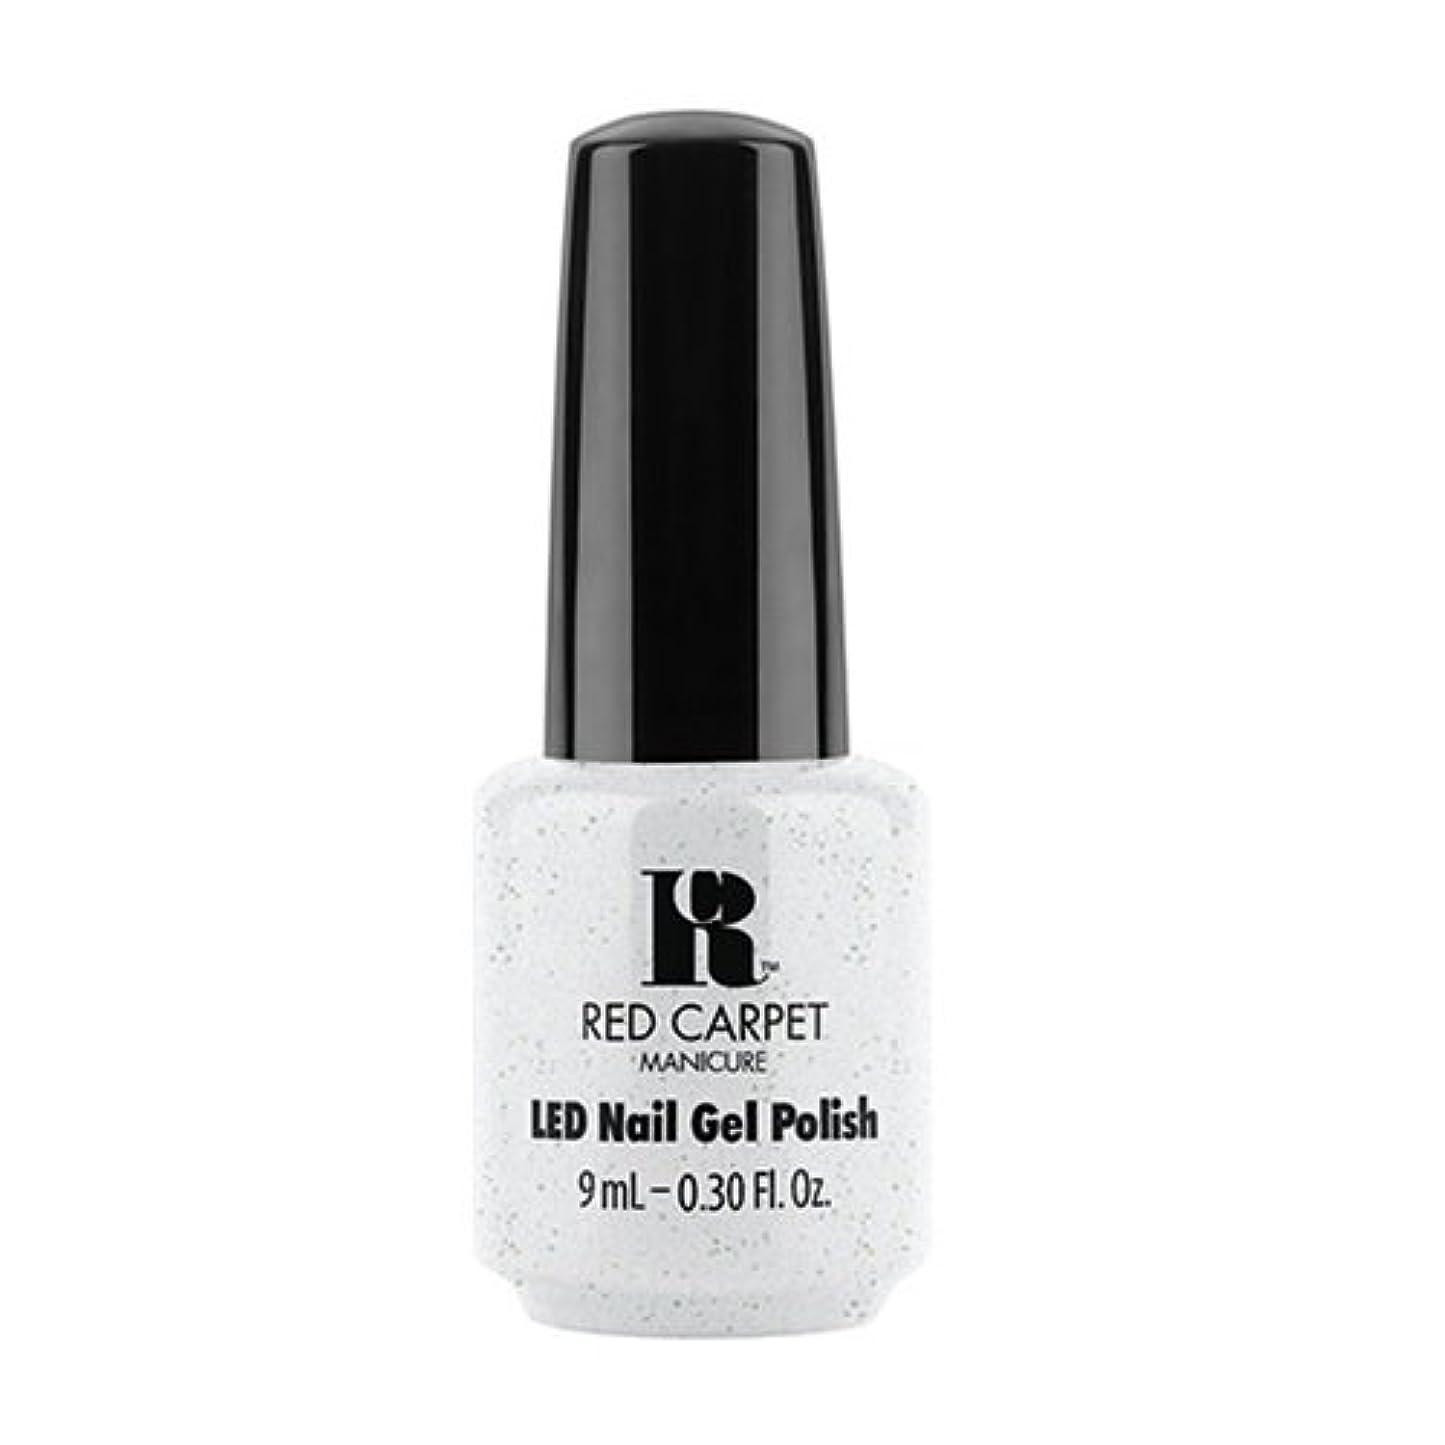 Red Carpet Manicure - LED Nail Gel Polish - Sugar Mama - 0.3oz / 9ml